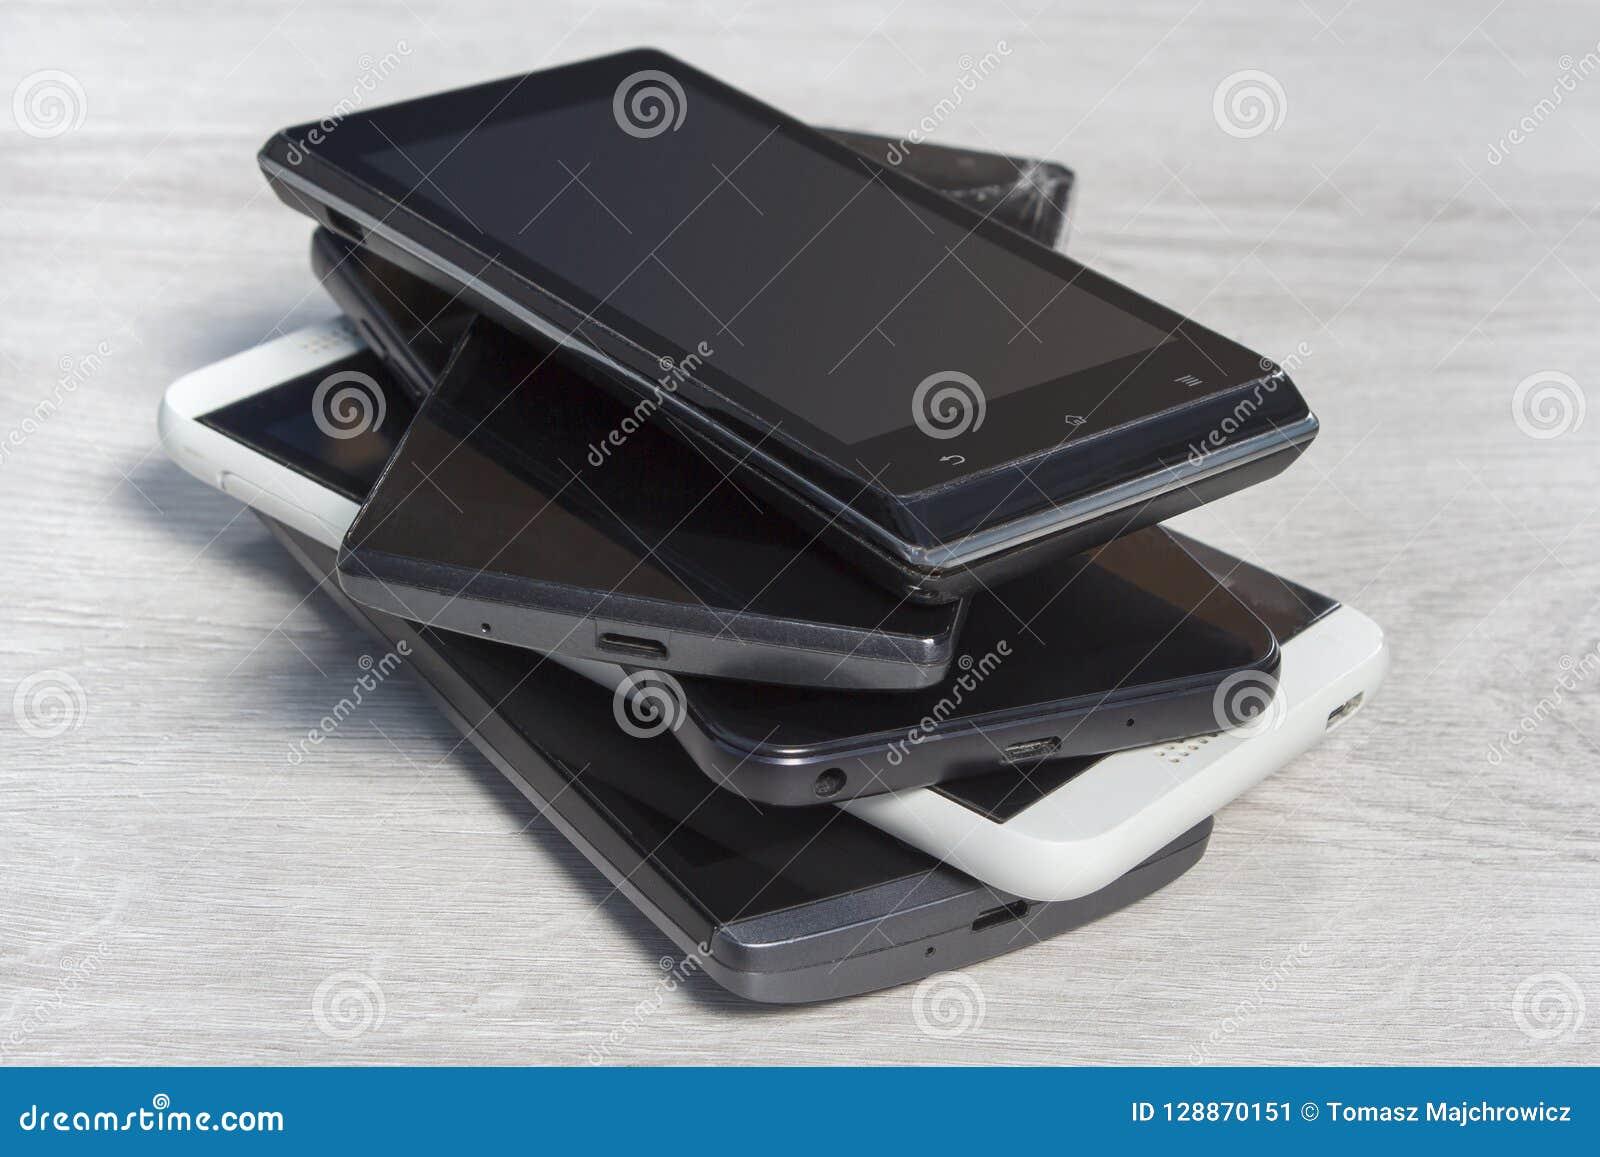 Smartphones bovenop elkaar wordt gestapeld is op de teller die